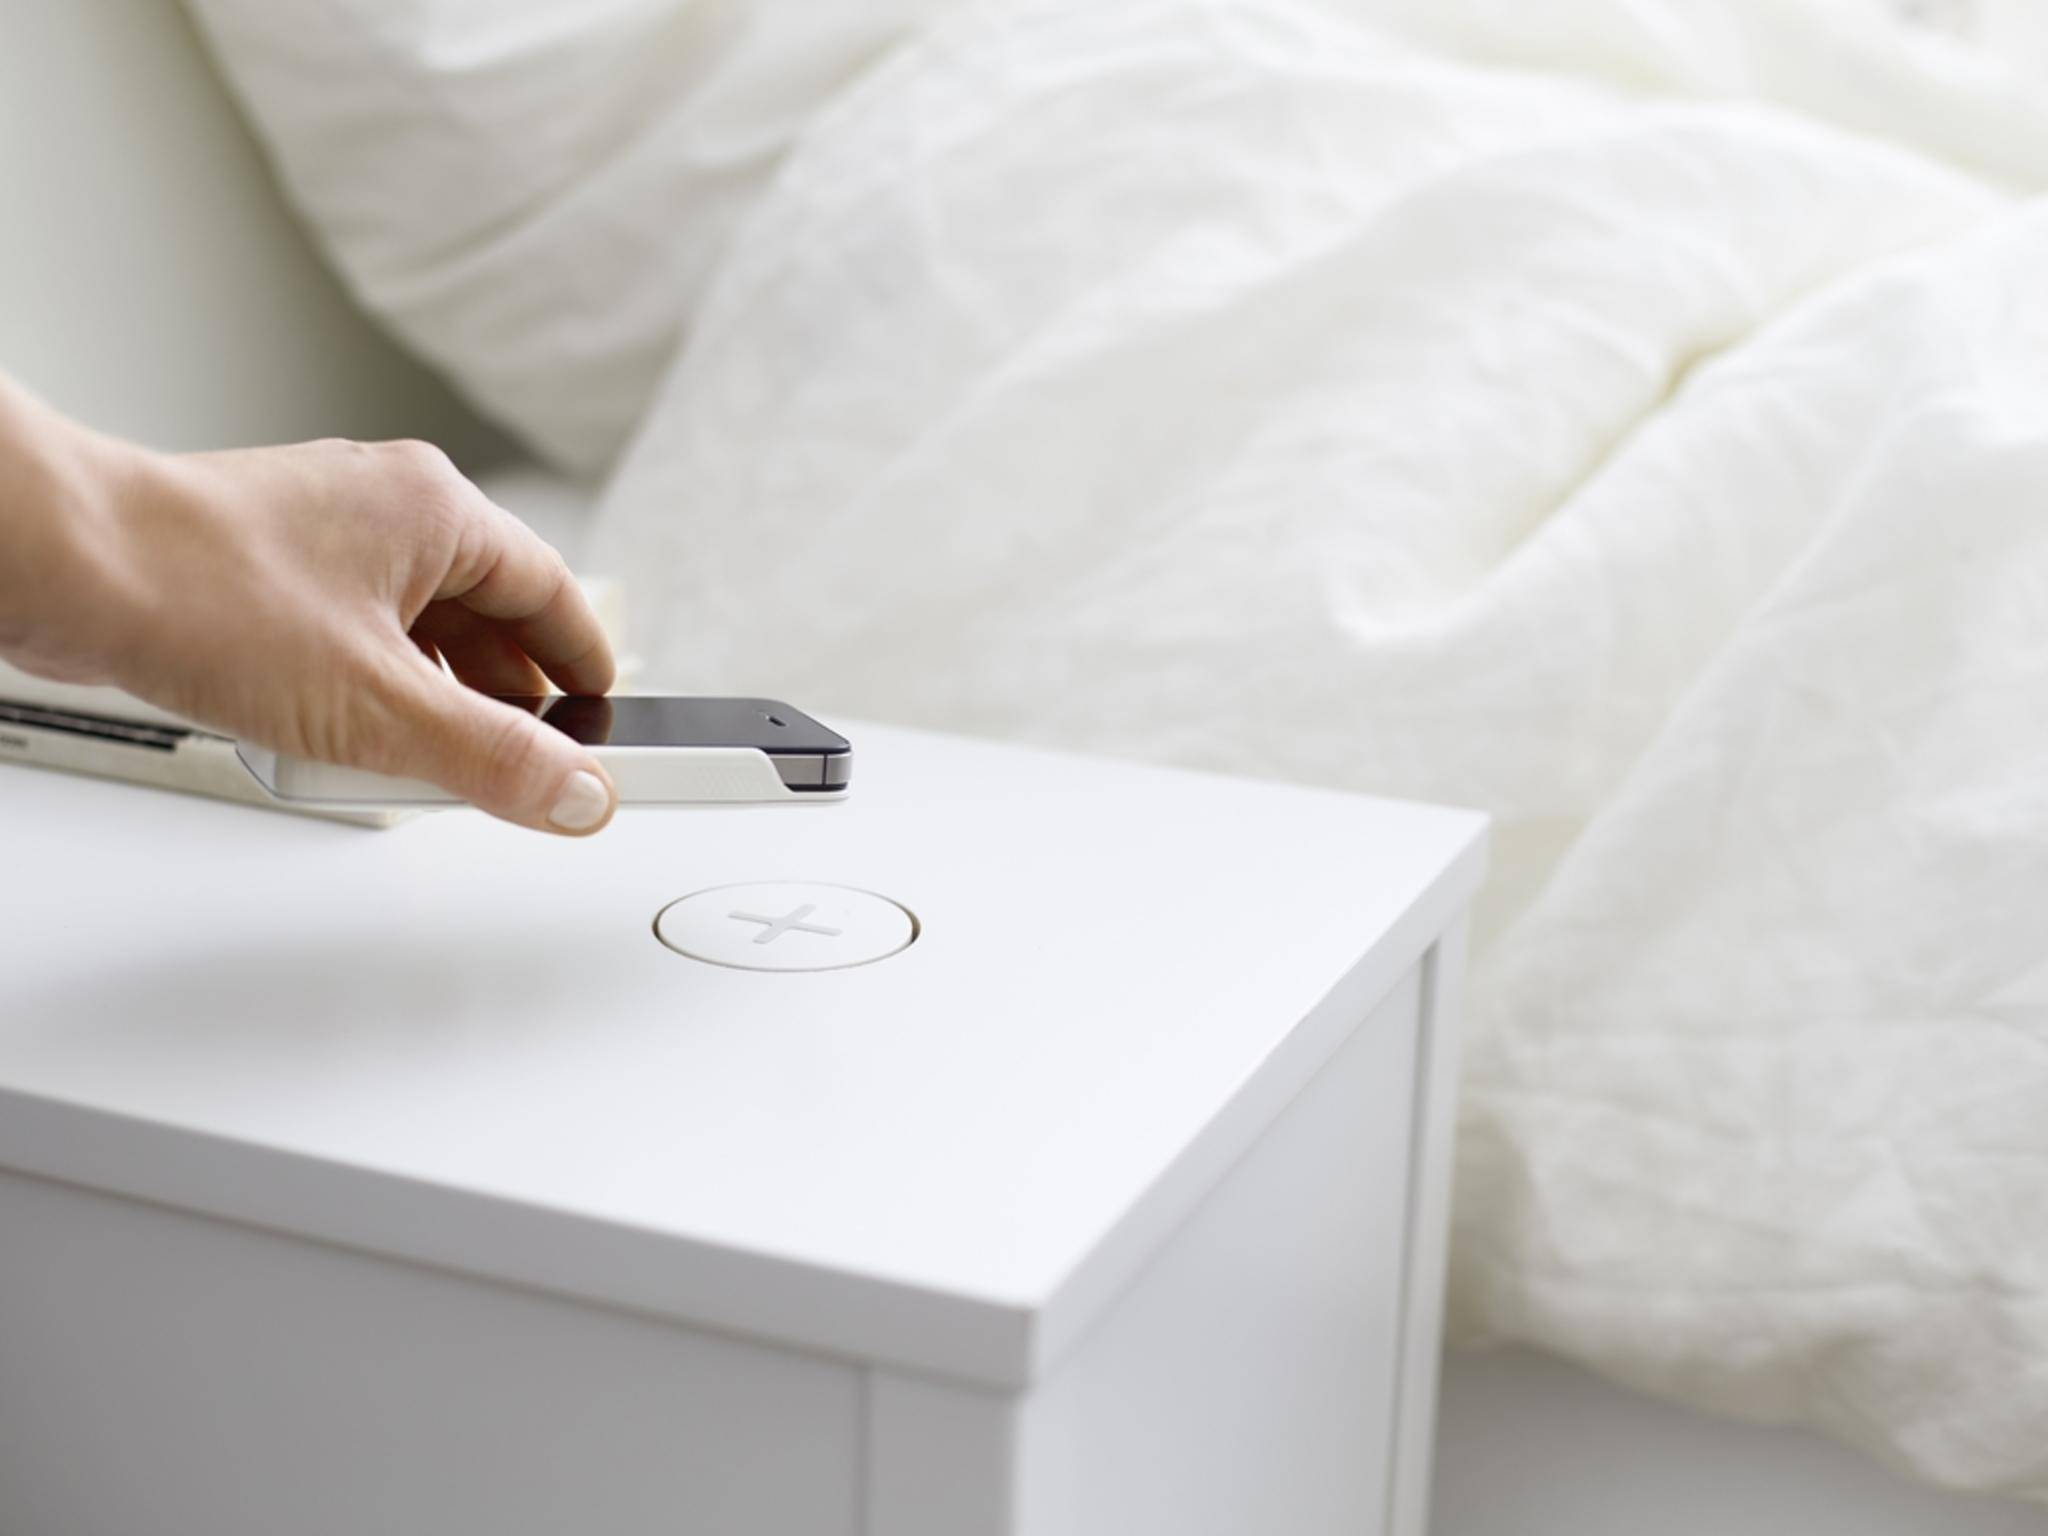 Selbst Ikea-Tische können Smartphones bereits kabellos aufladen.